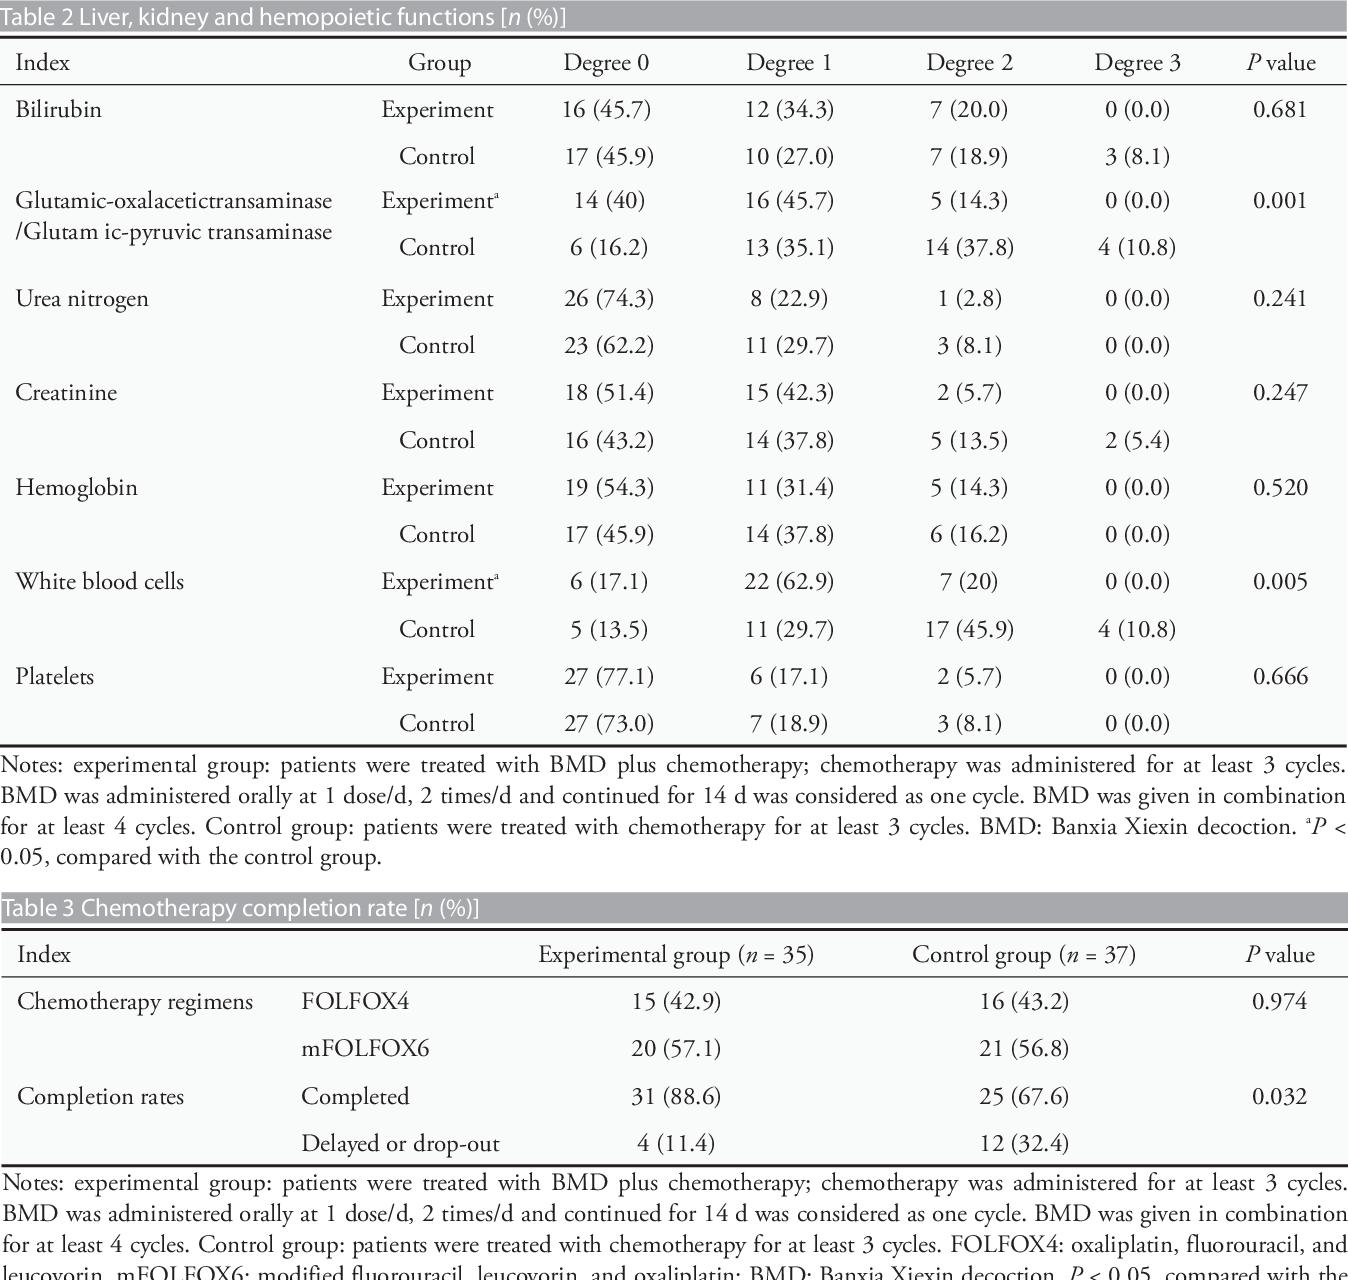 Stage III Colon Cancer - Semantic Scholar